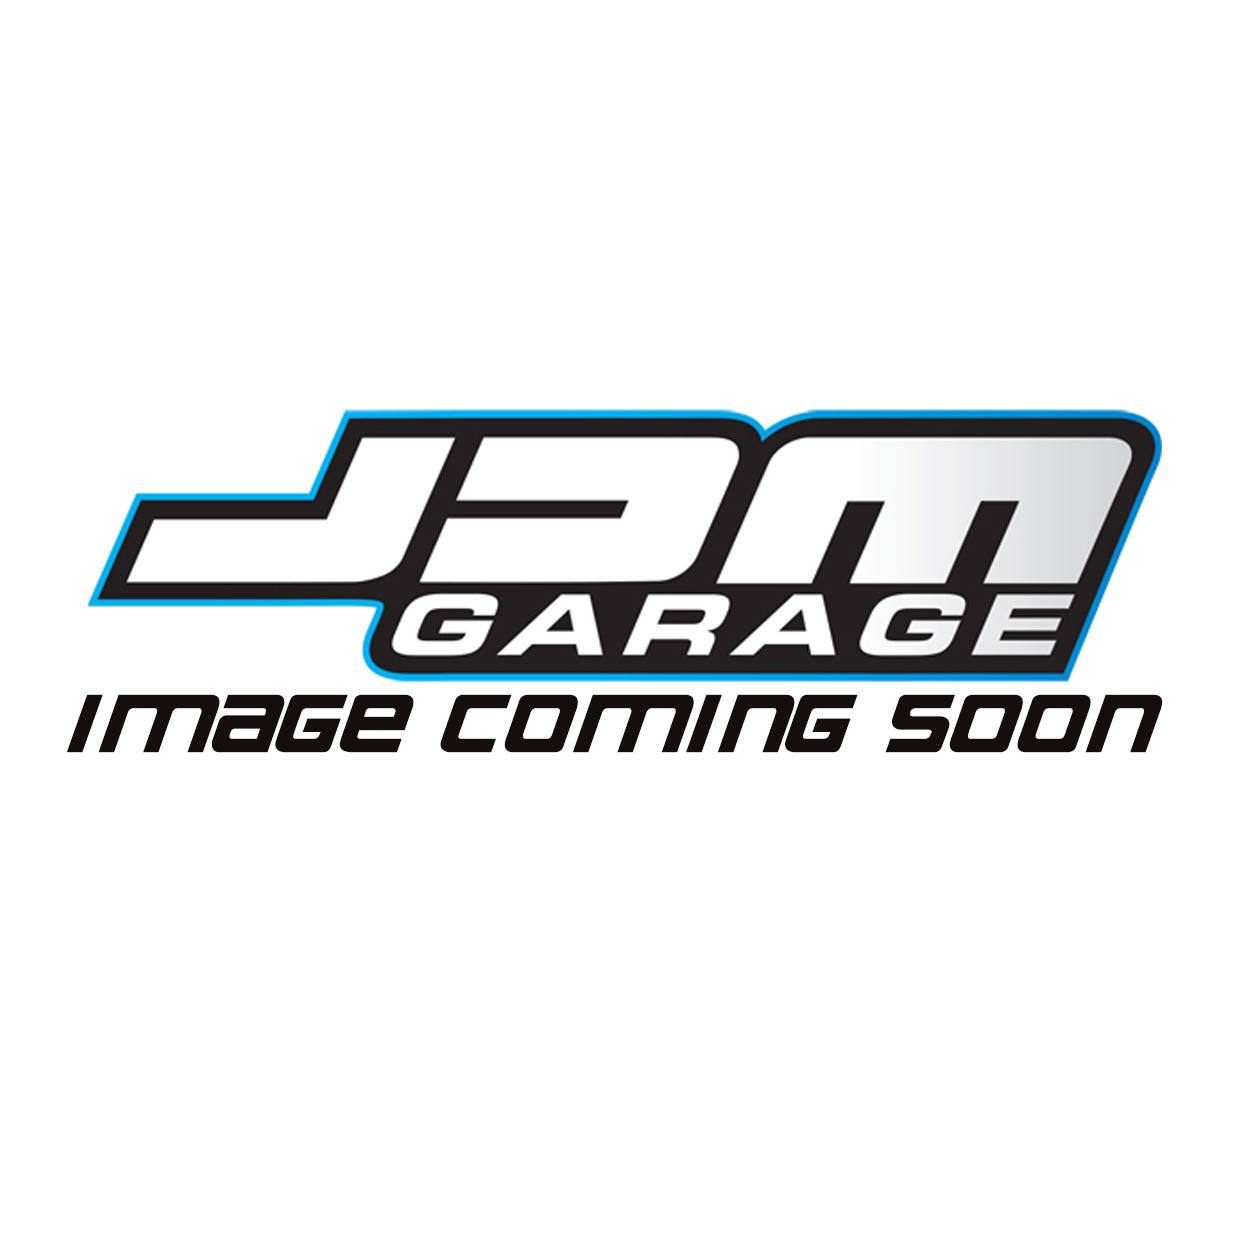 Genuine Nissan Elipse B-Pillar Trim Clip For Nissan Skyline R31 R33 GTST R34 GTT GTR Stagea Silvia S13 180SX 200SX 76848-71S00